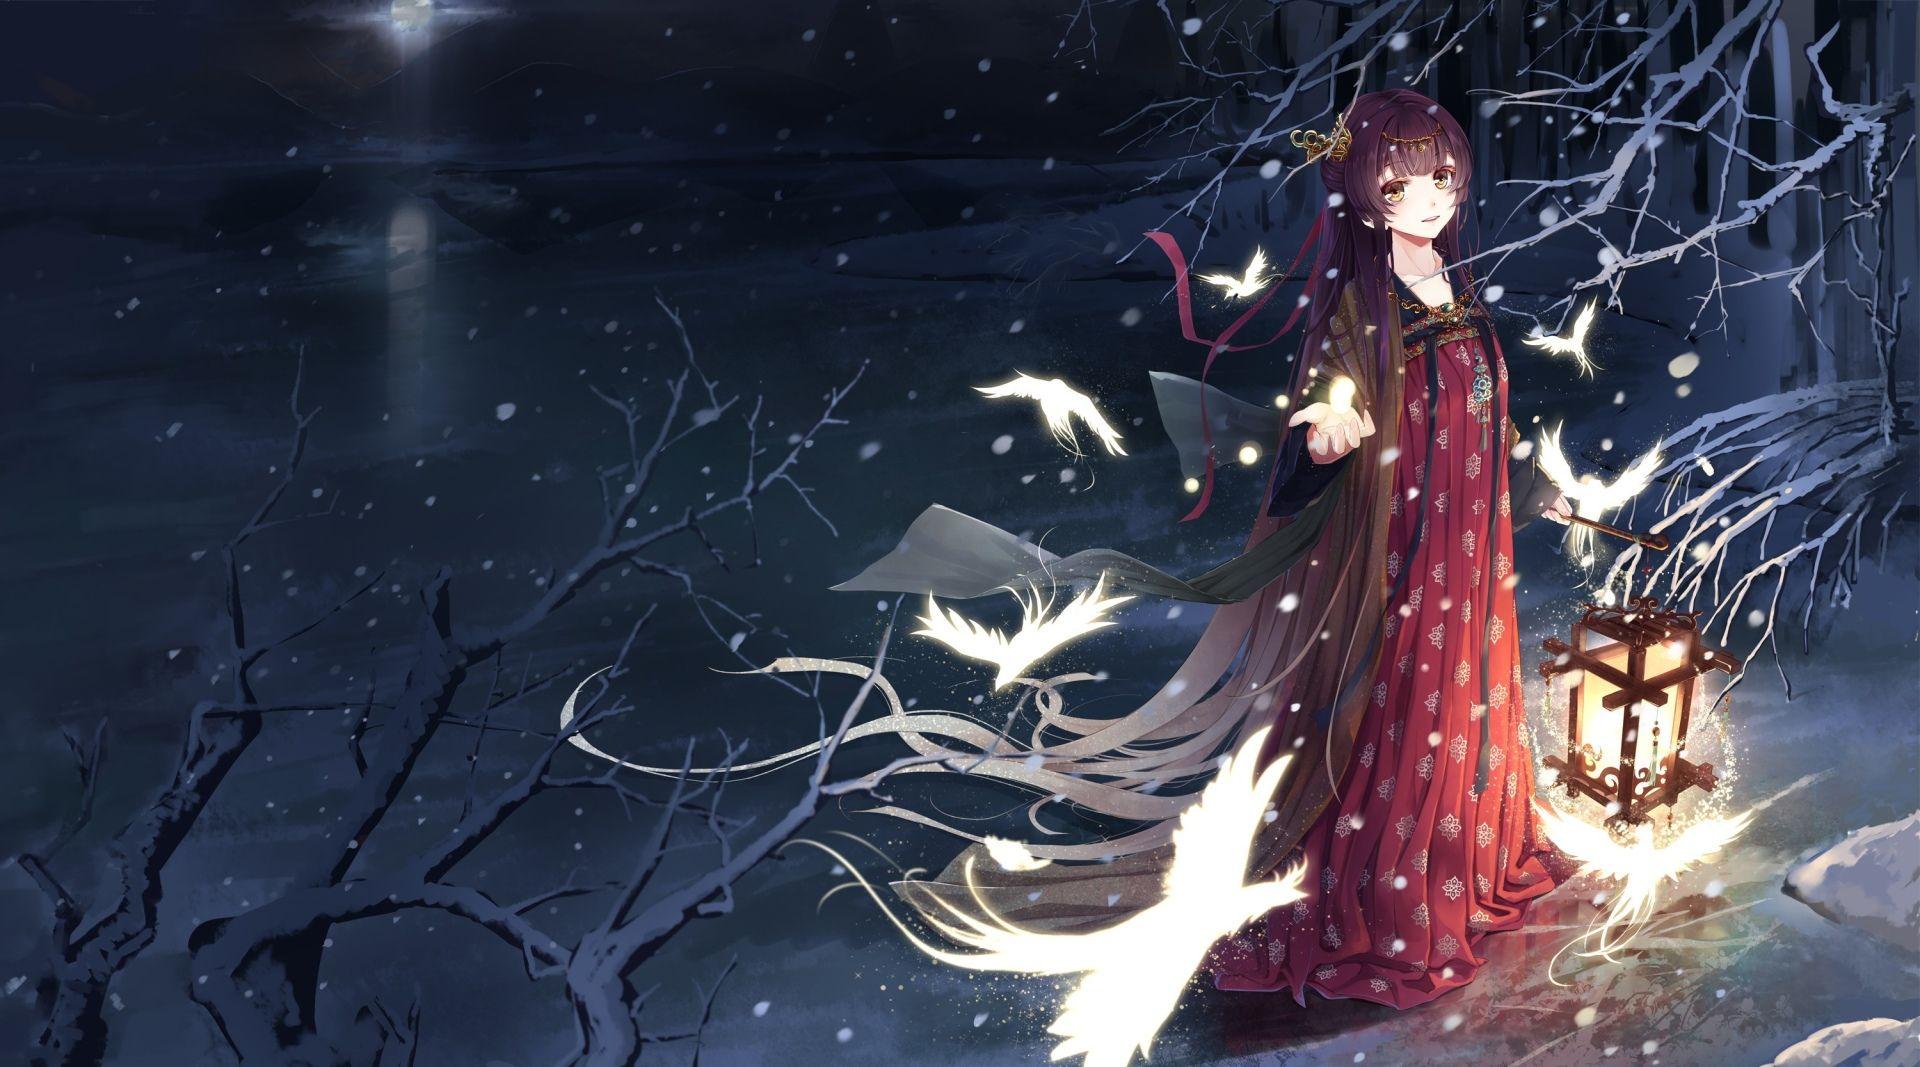 Anime winter wallpaper hd